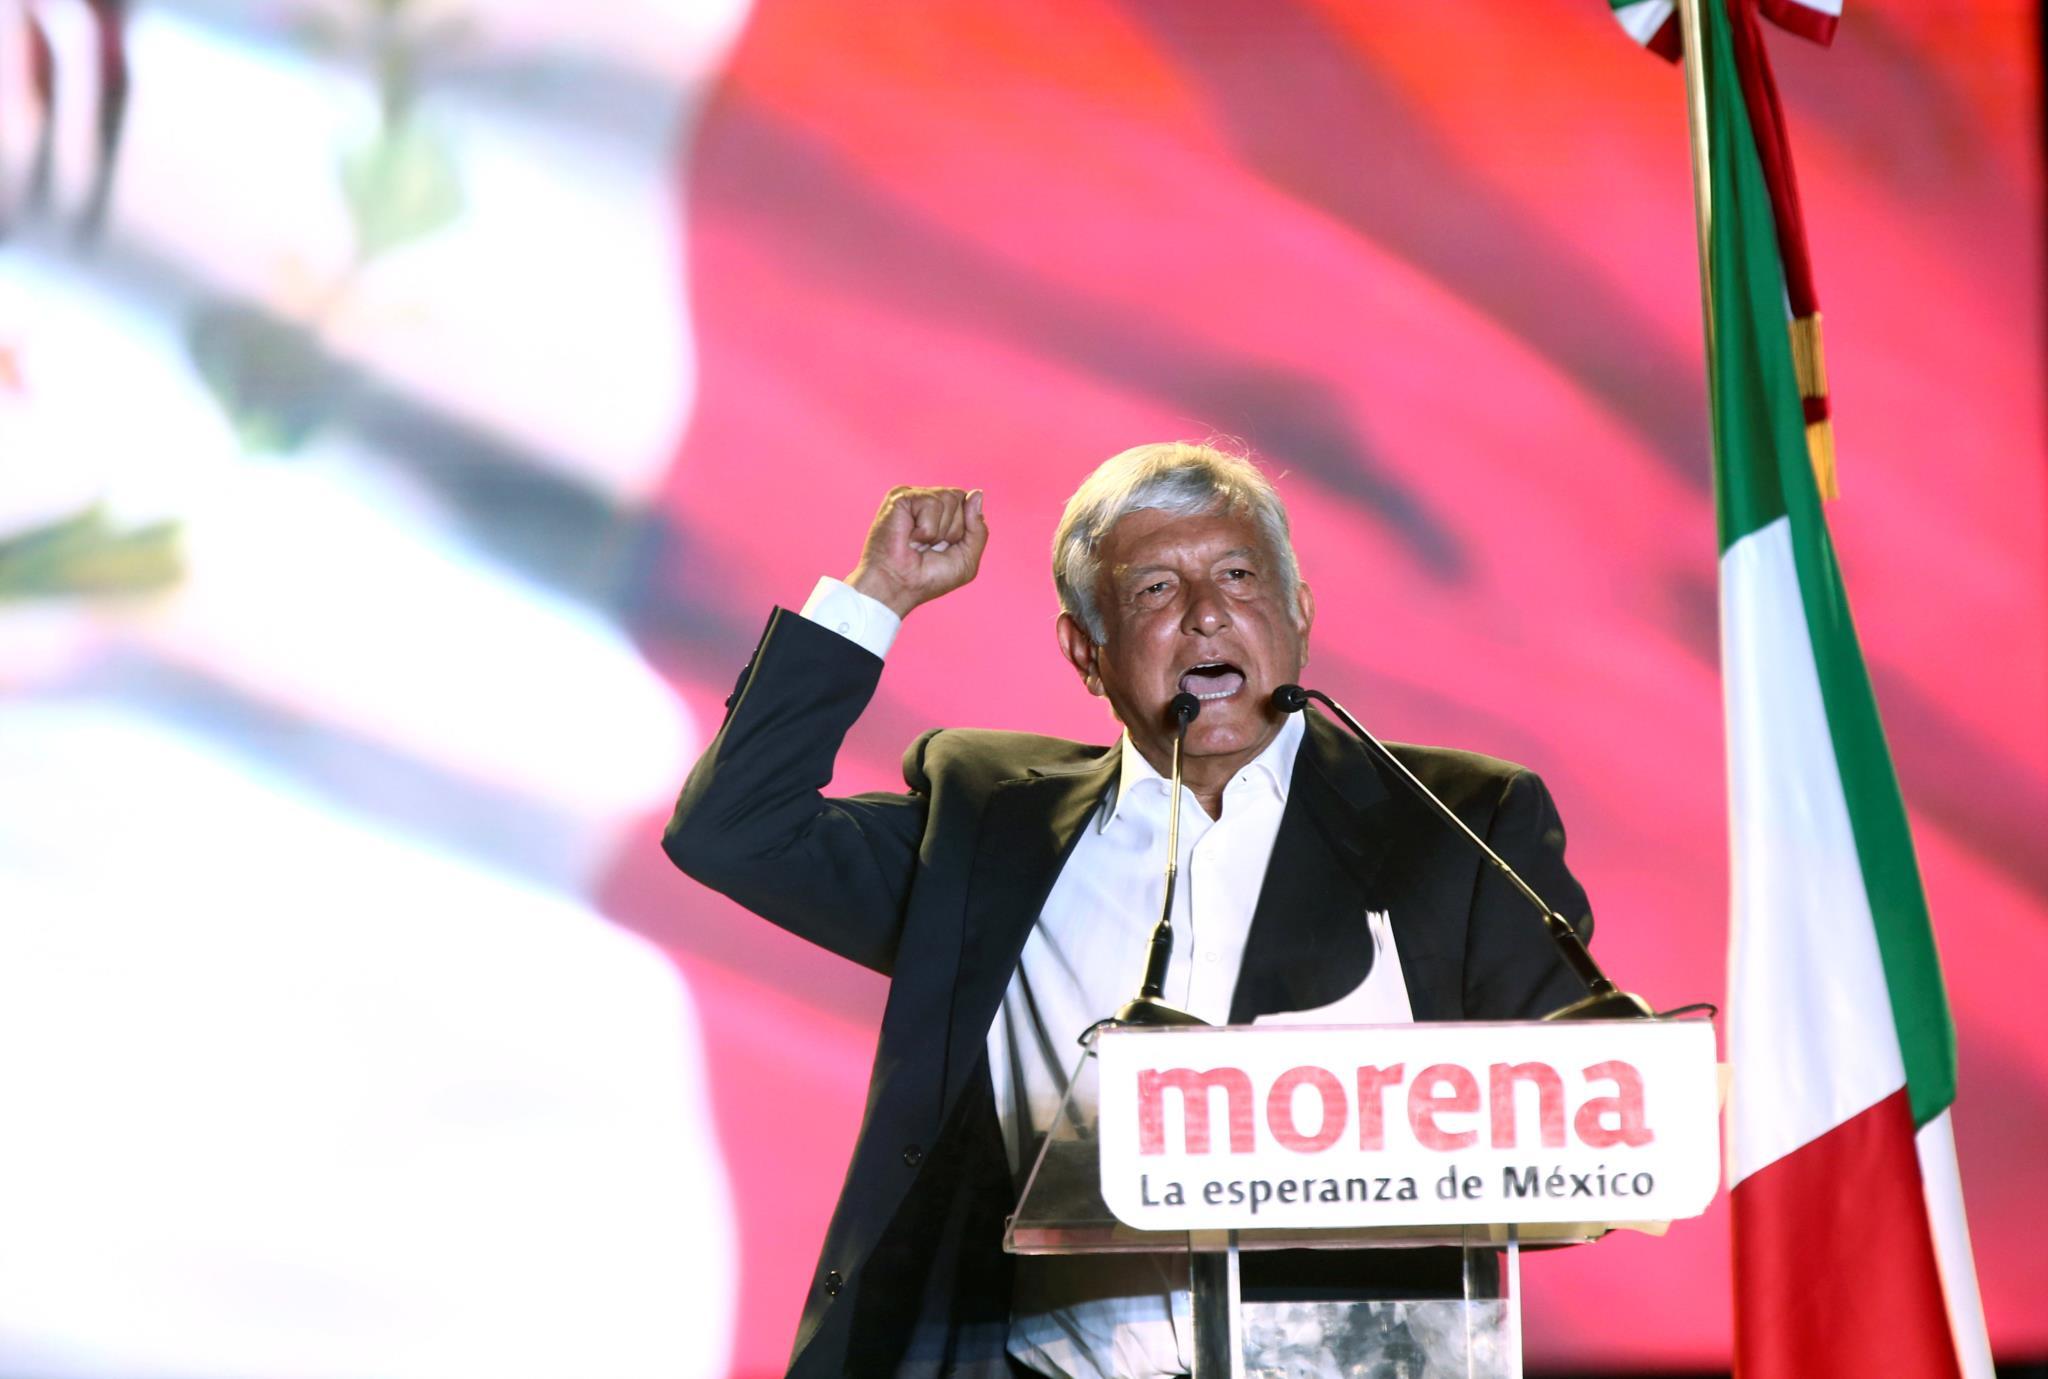 Andrés Manuel López Obrador, México, eleição geral do México, 2018, eleição geral do México, 2012